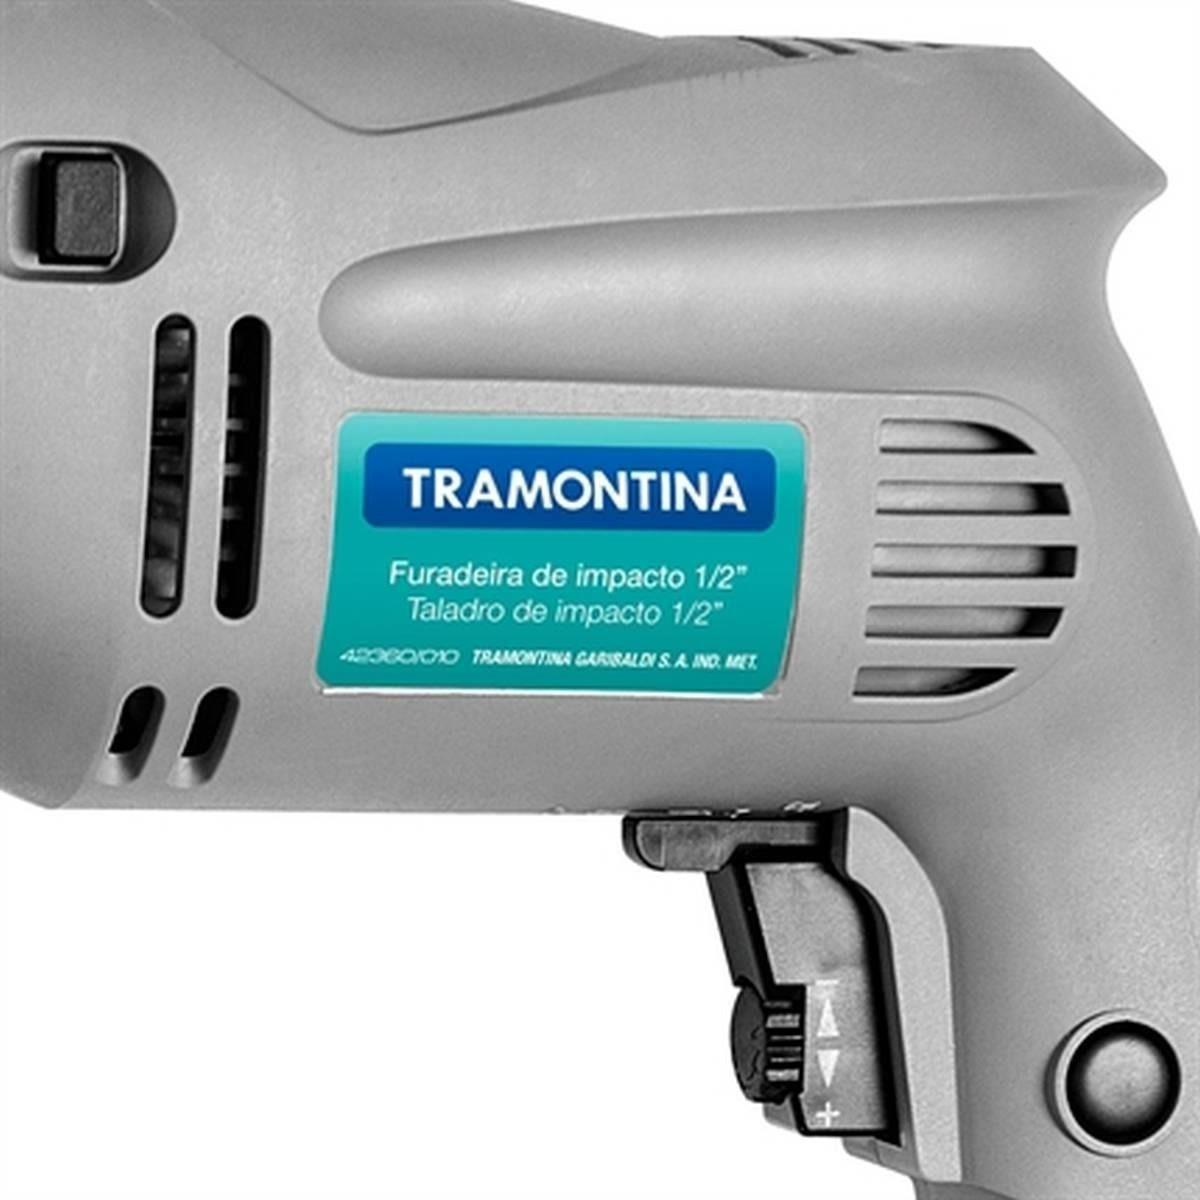 Furadeira Elétrica 1/2 - 13mm Polegadas 500w Tramontina